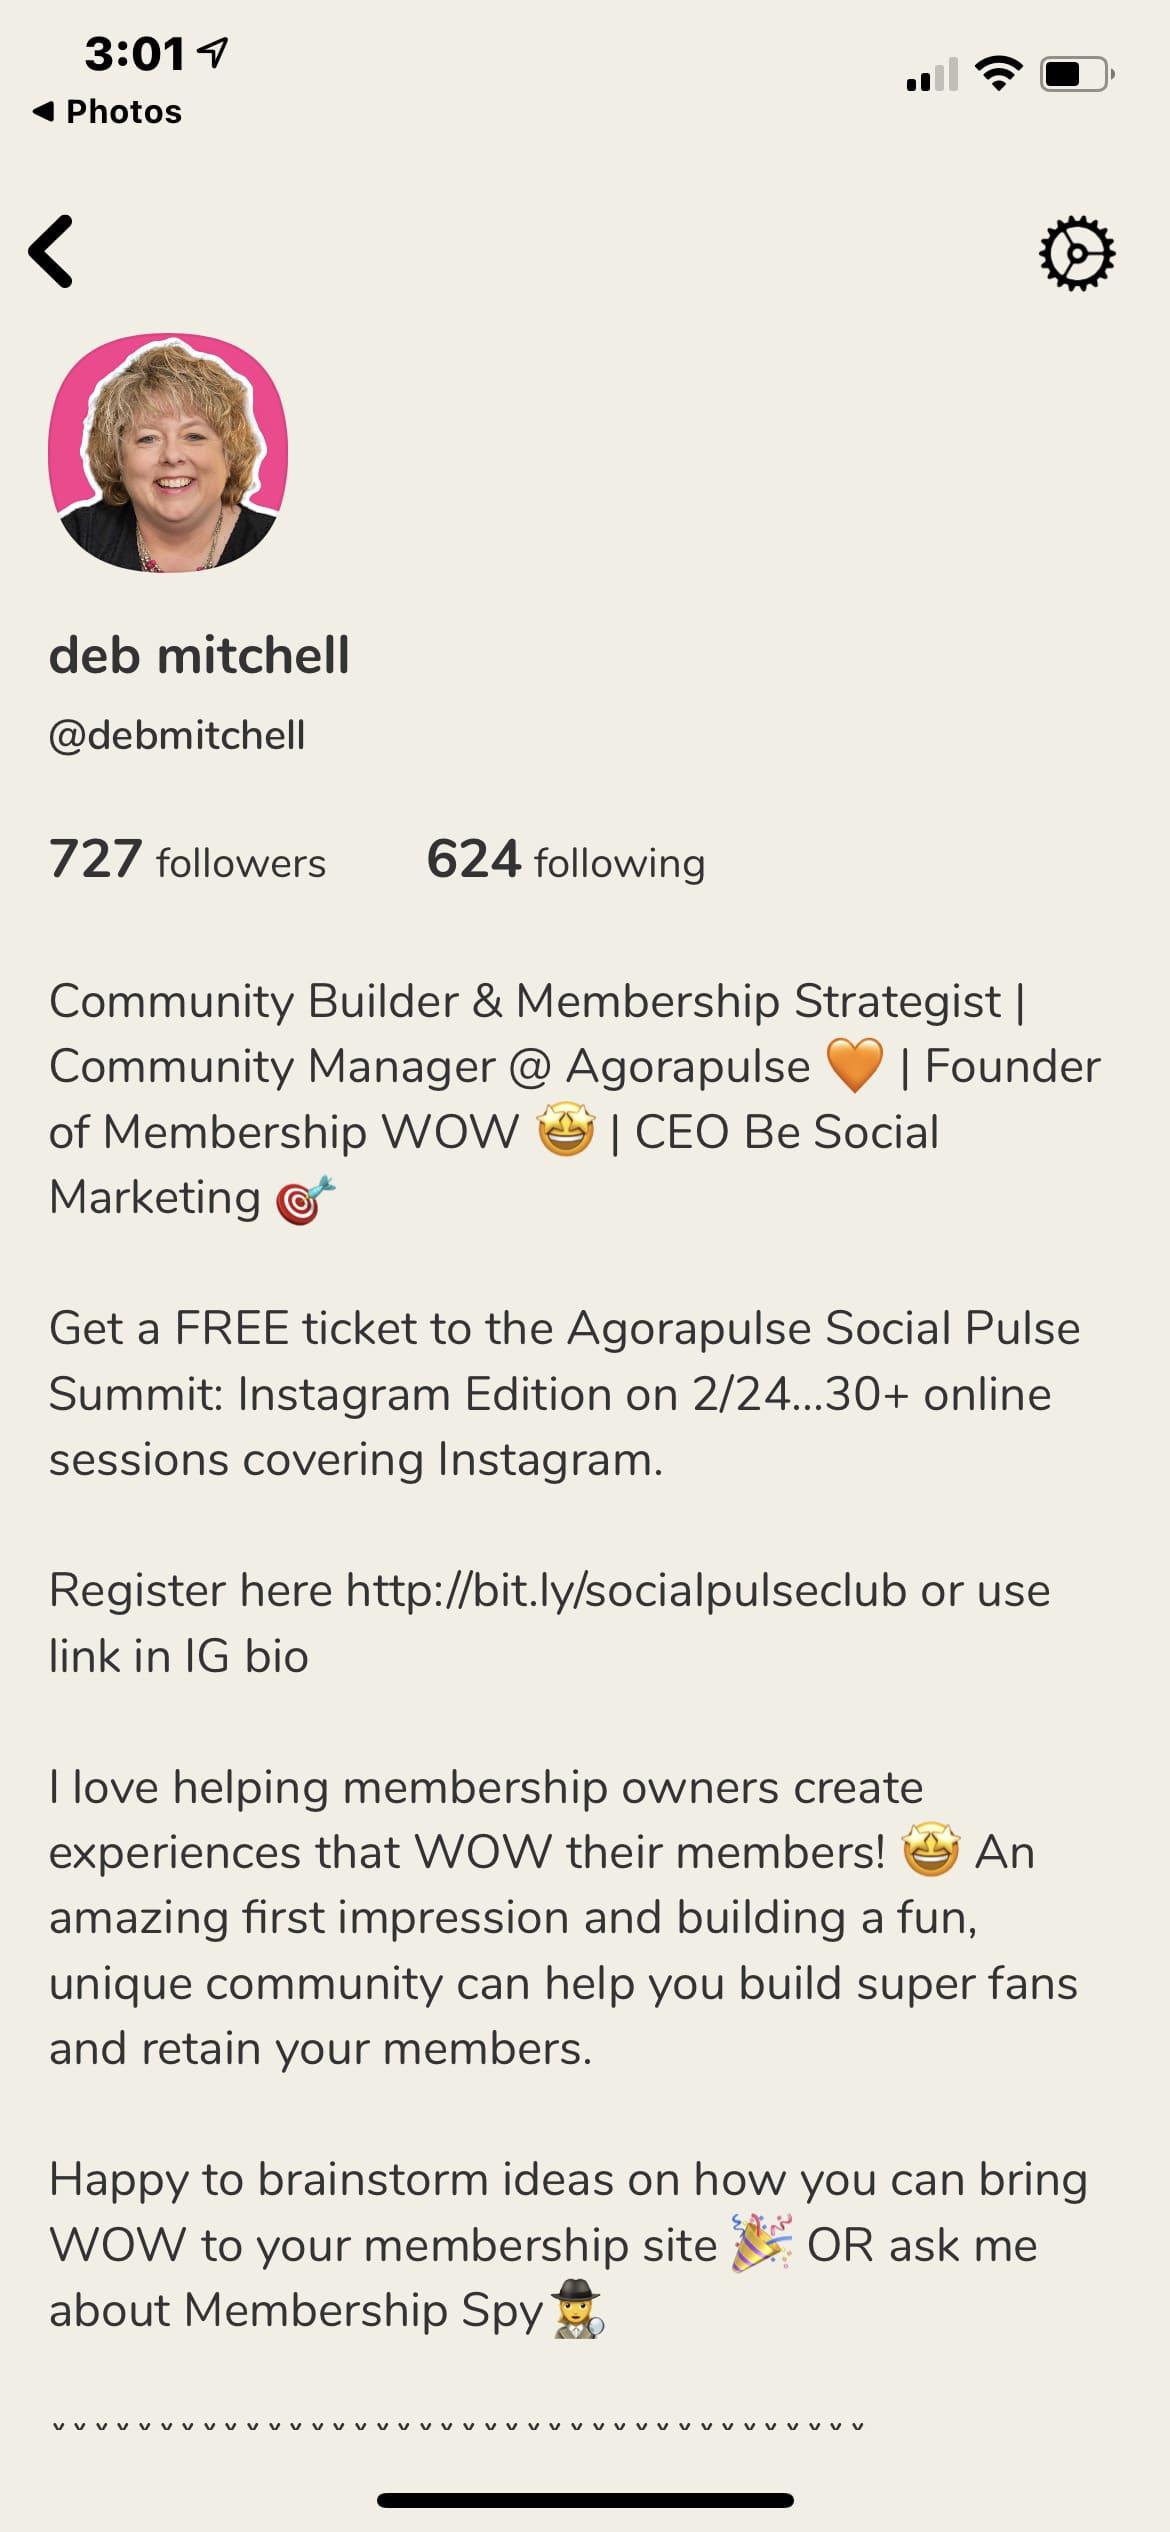 Profil in der Clubhouse-App